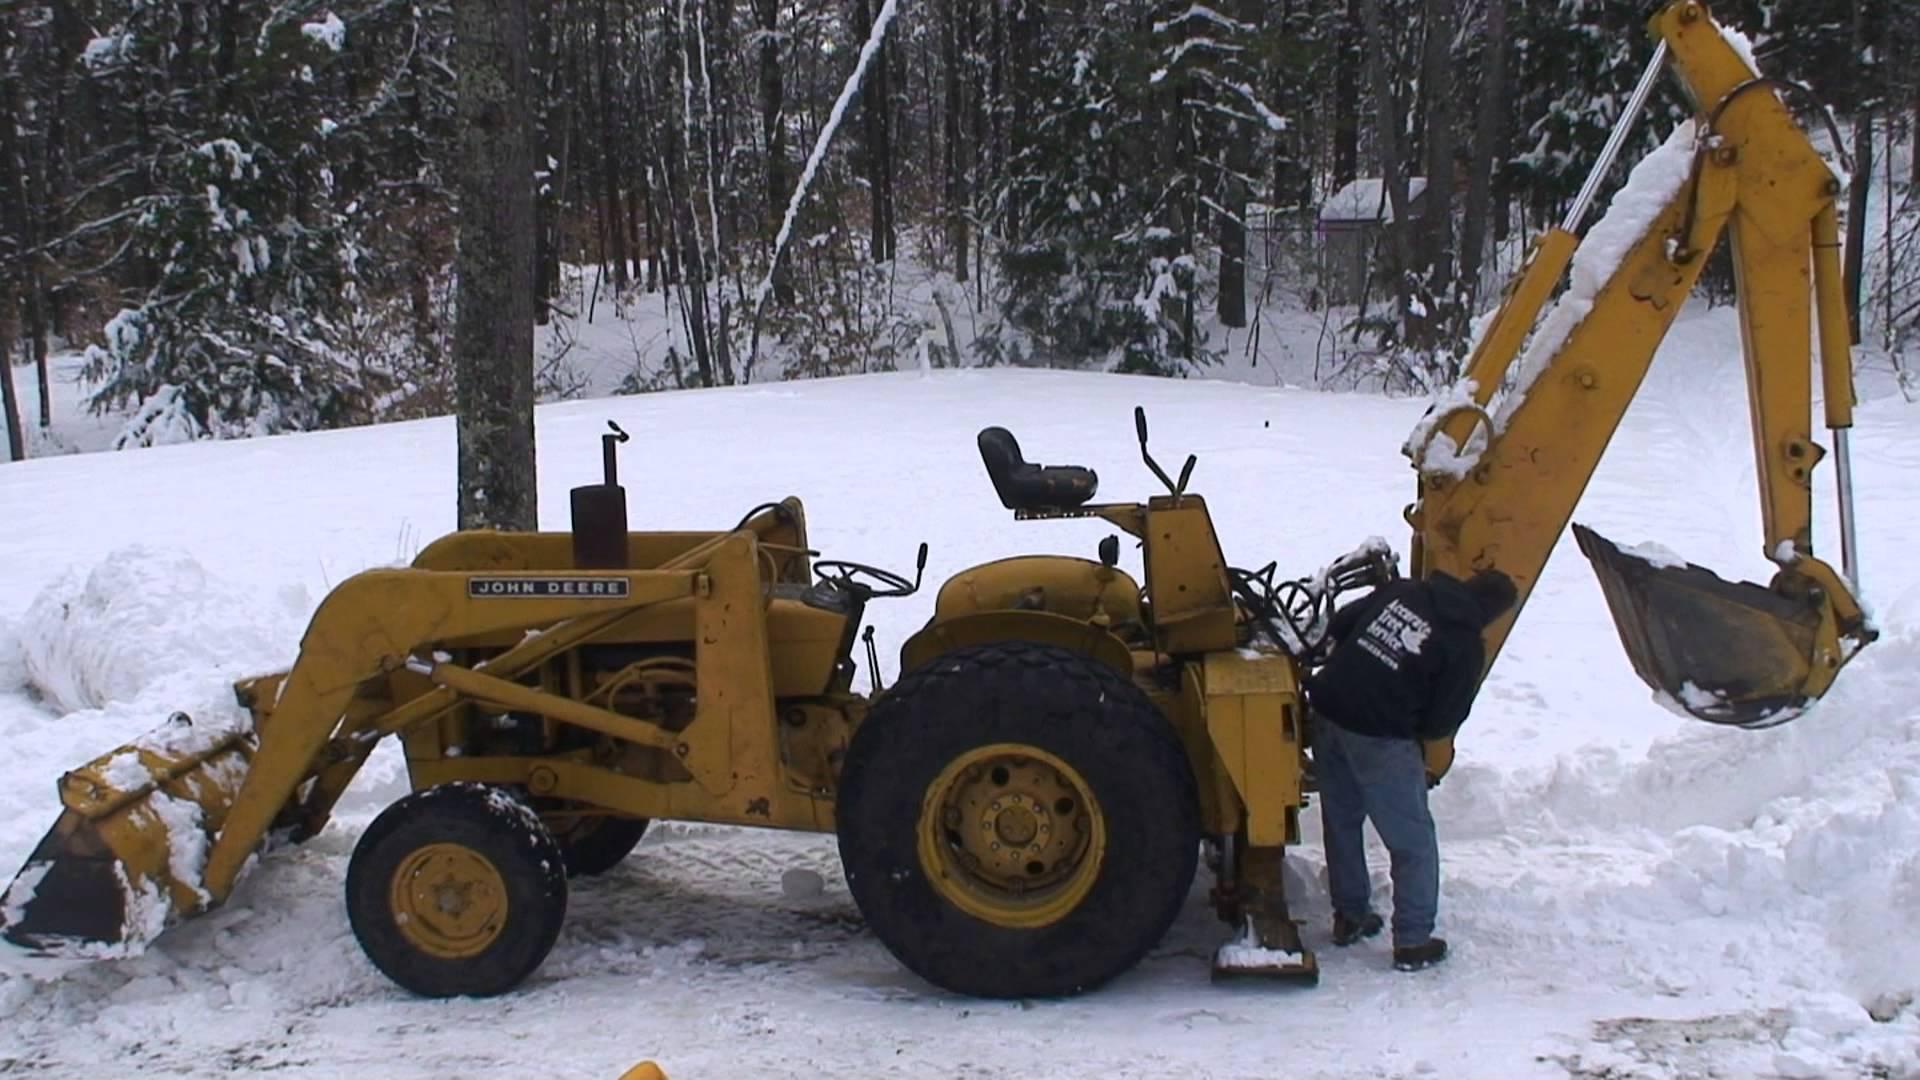 1970 John Deere JD400 Tractor Loader Backhoe - YouTube